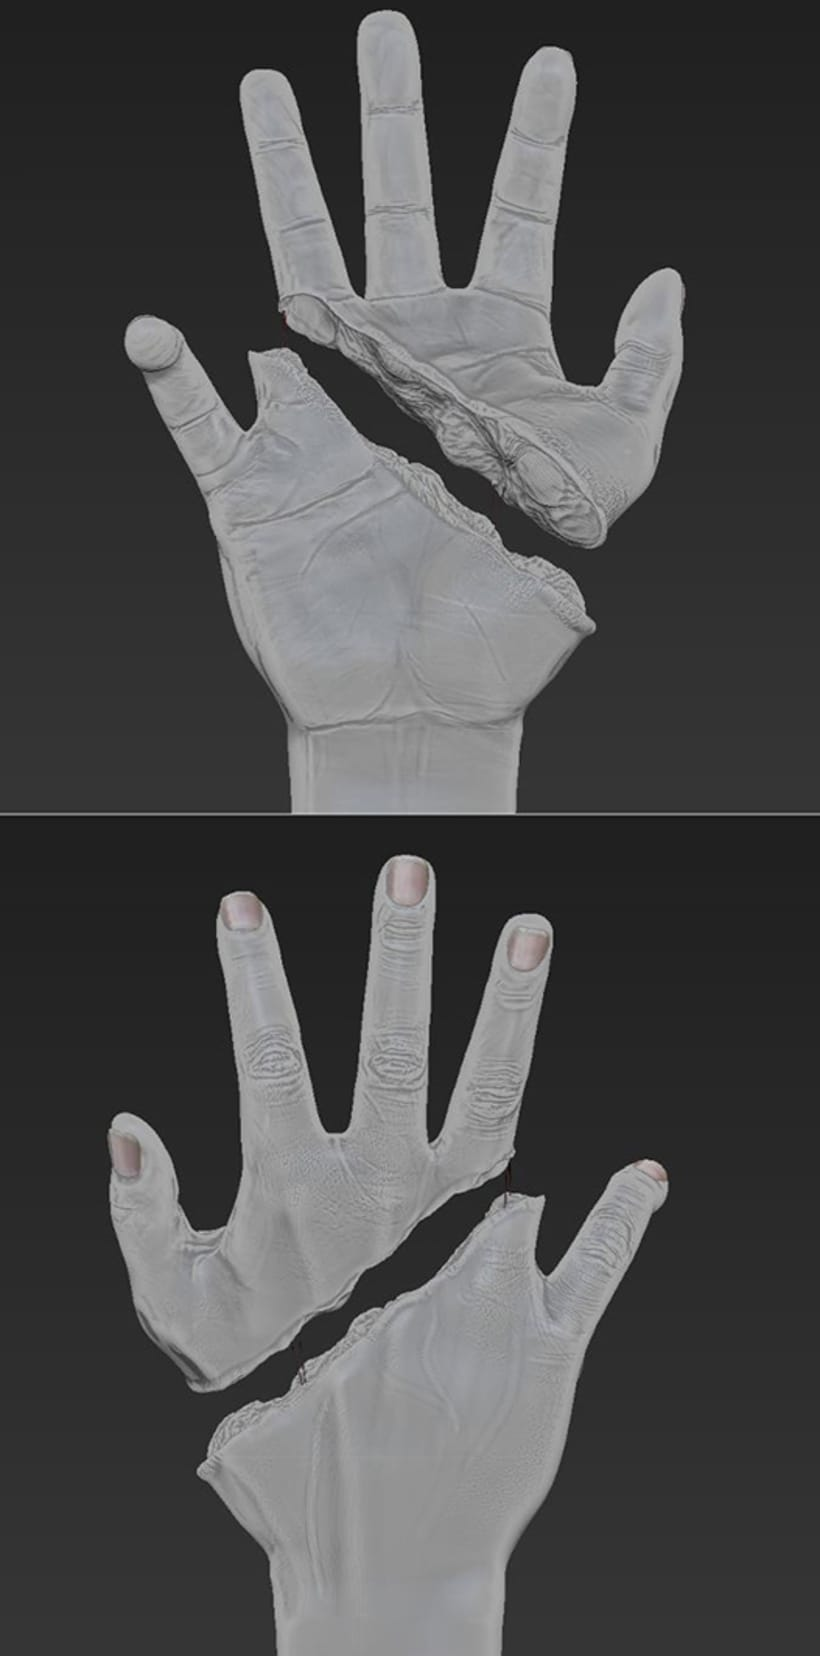 3D HAND _ Medical illustration to walking dead XD 1